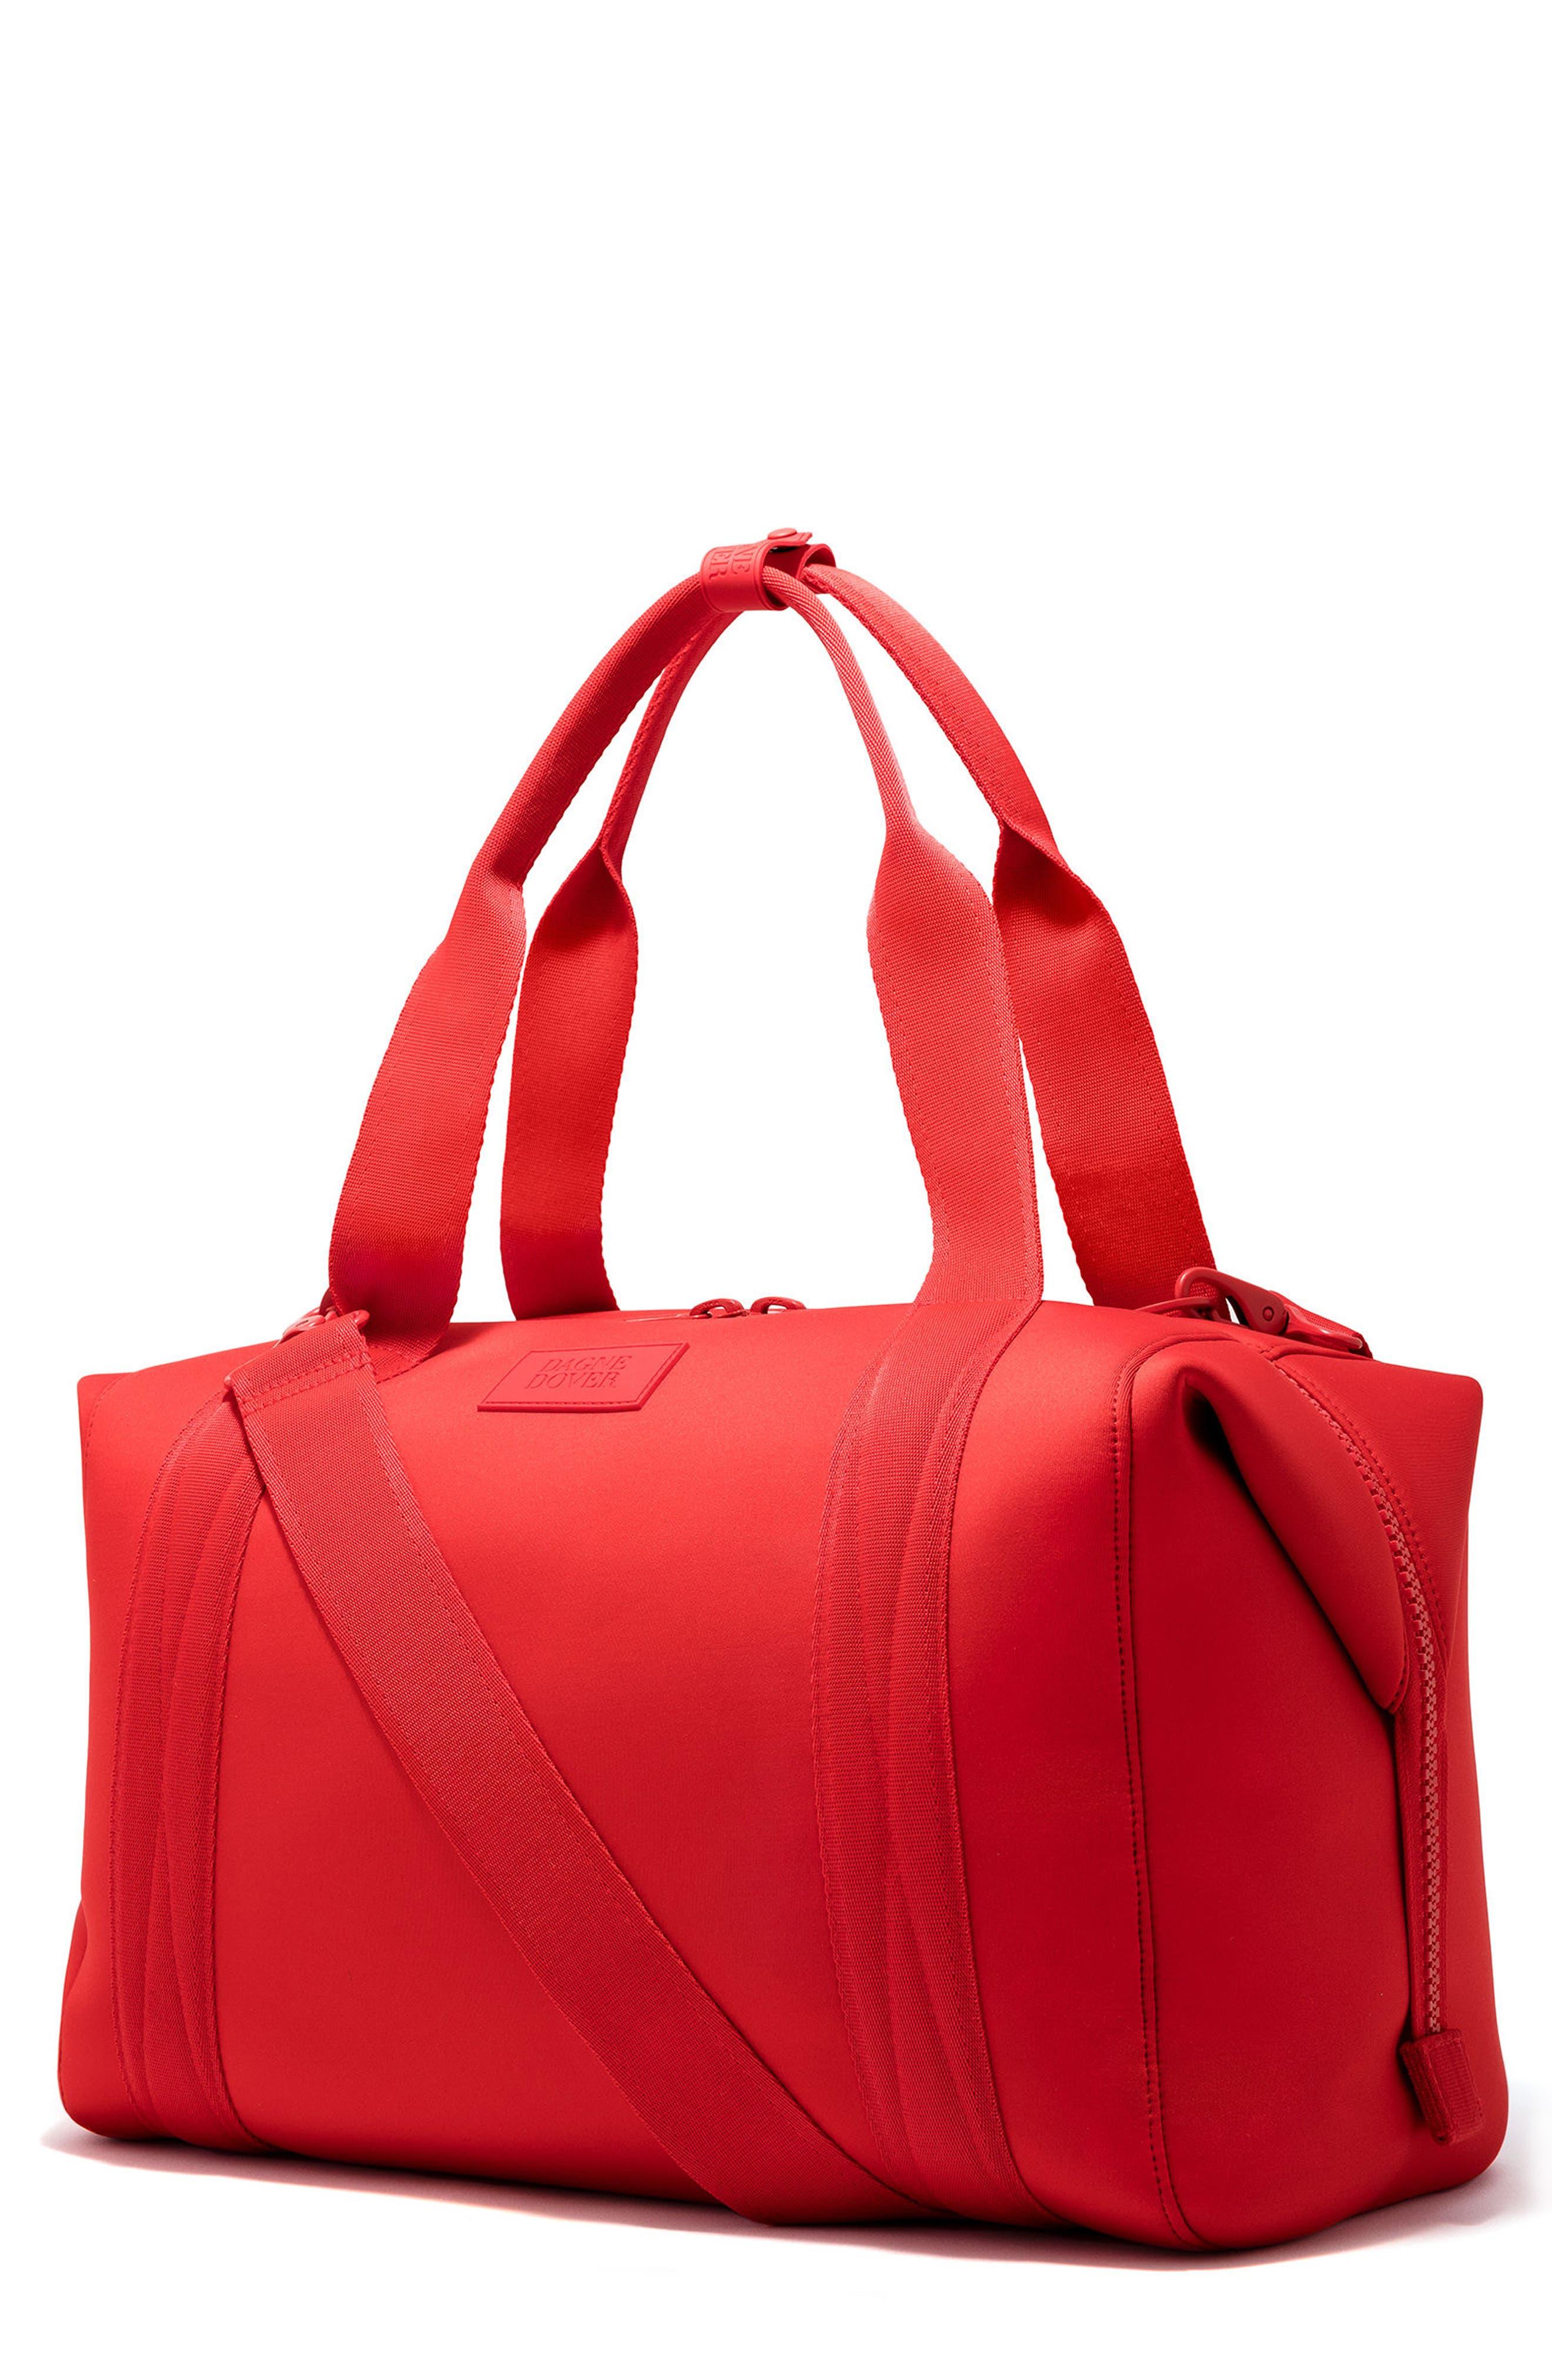 365 Large Landon Neoprene Carryall Duffel Bag,                             Alternate thumbnail 25, color,